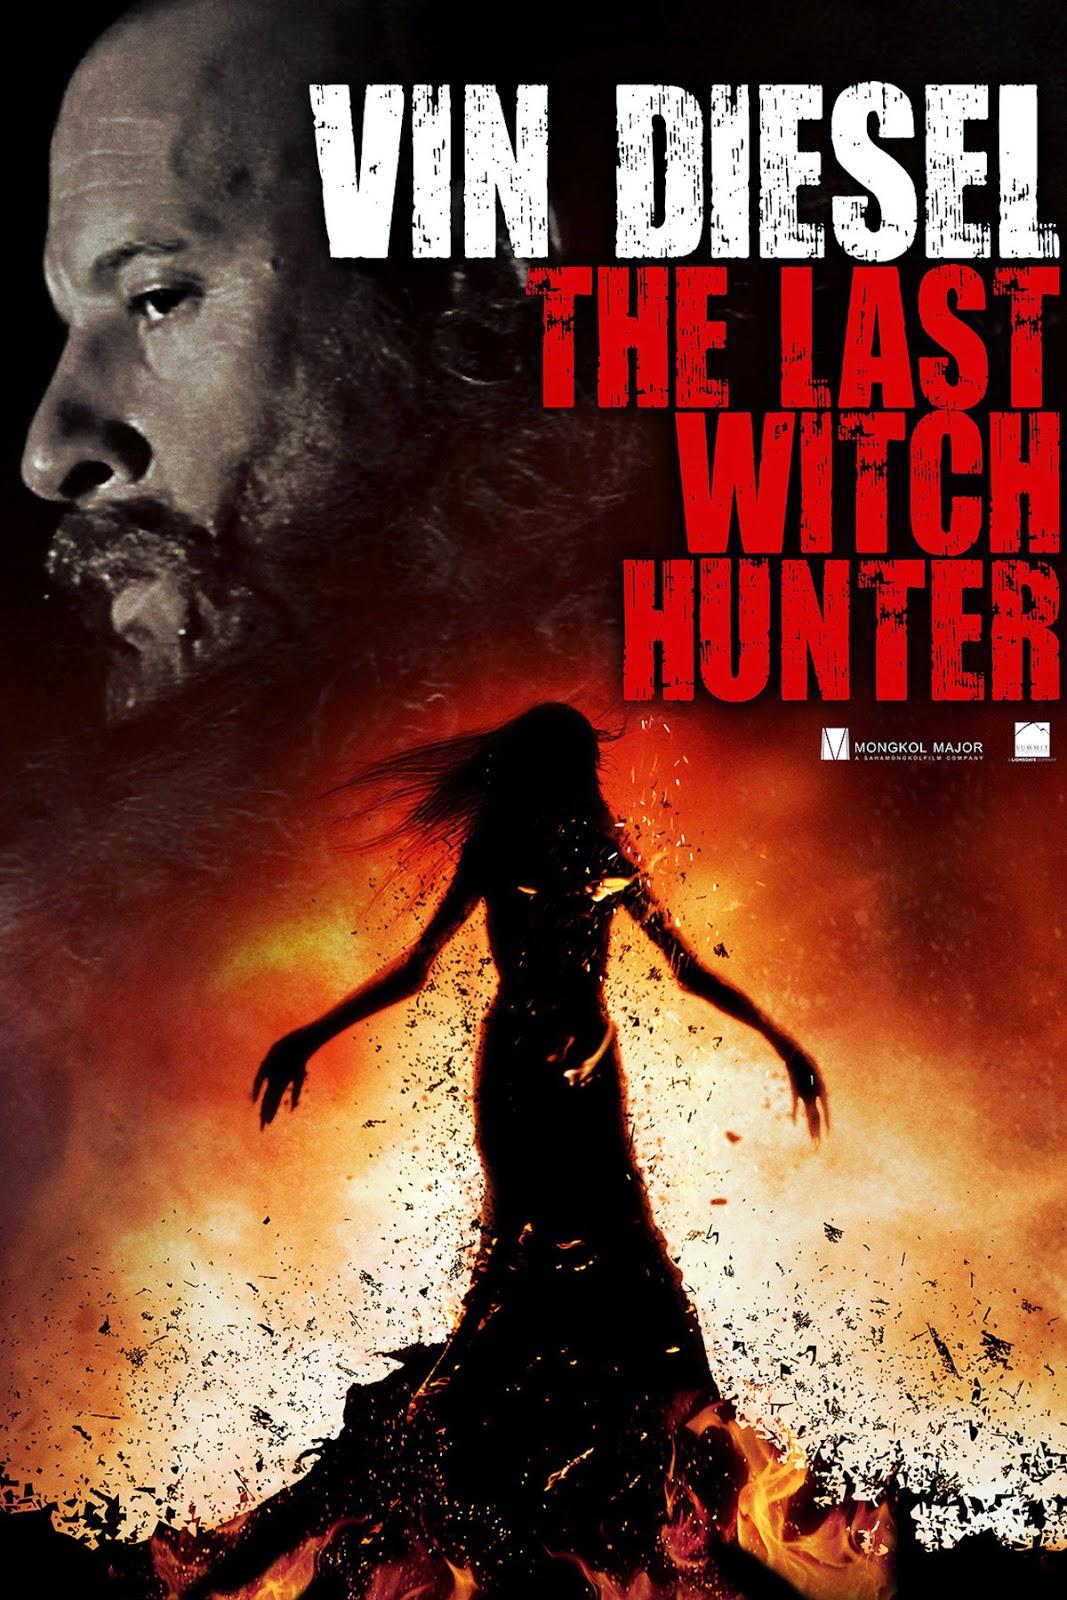 The Last Witch Hunter เดอะ ลาสต์ วิทช์ ฮันเตอร์ เพชฌฆาตแม่มด [HD]